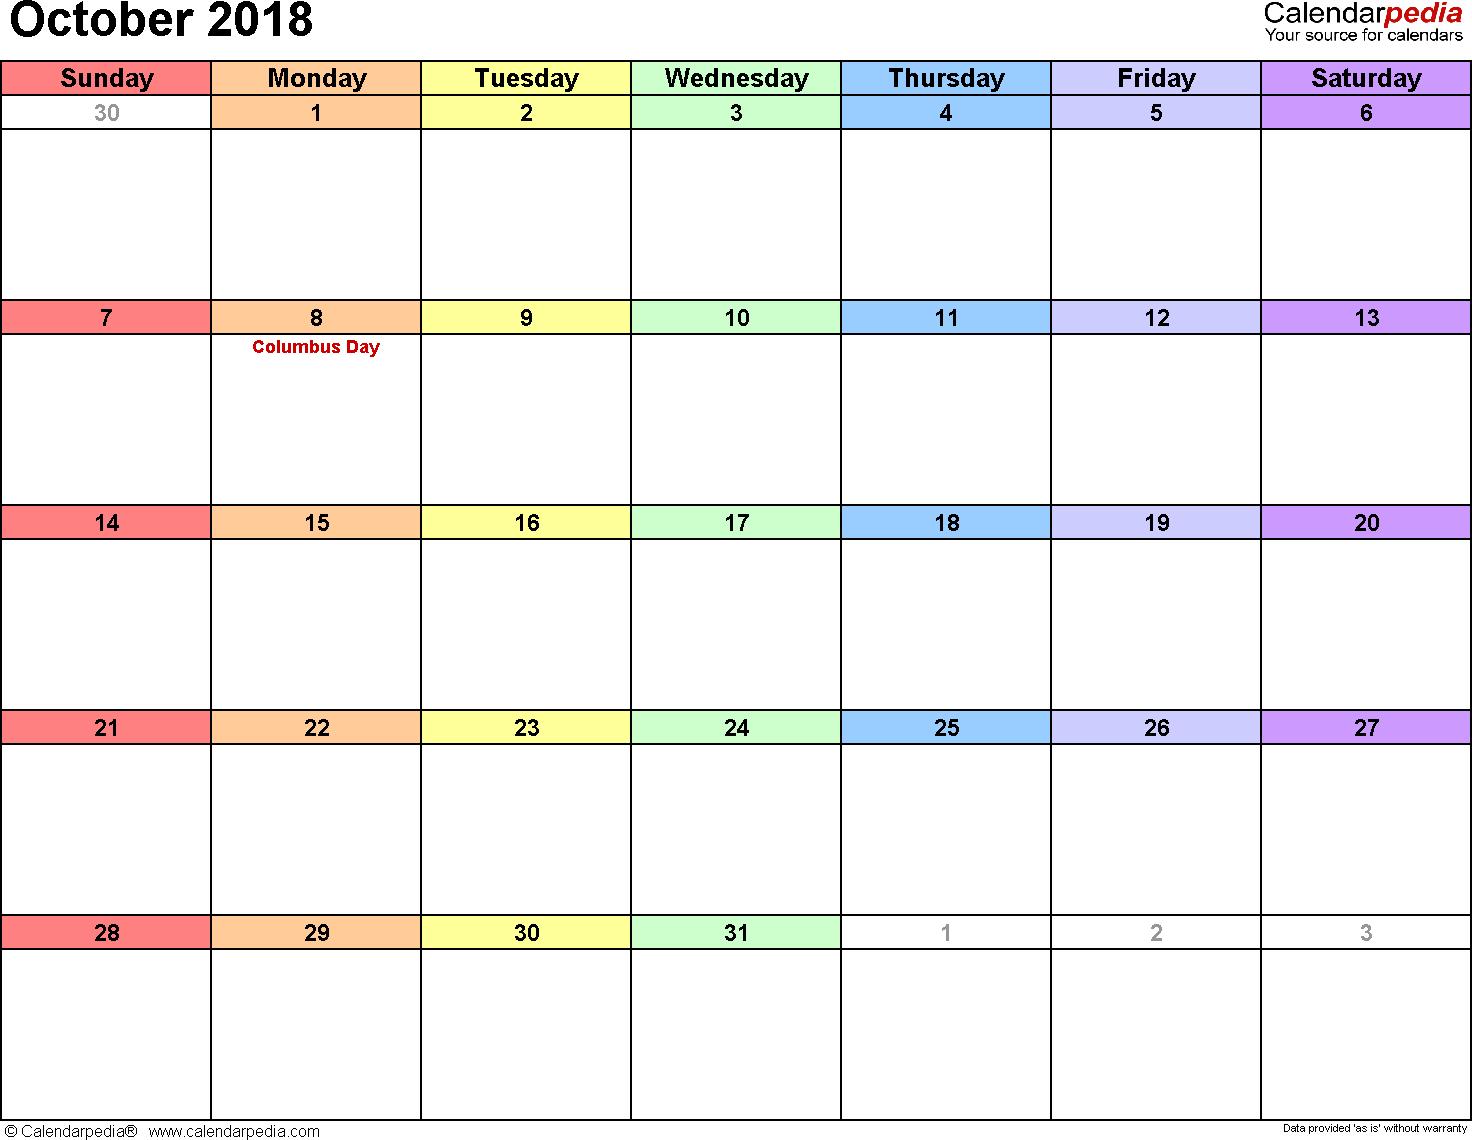 Calendarpedia Word Templates For All Kinds Of Calendar